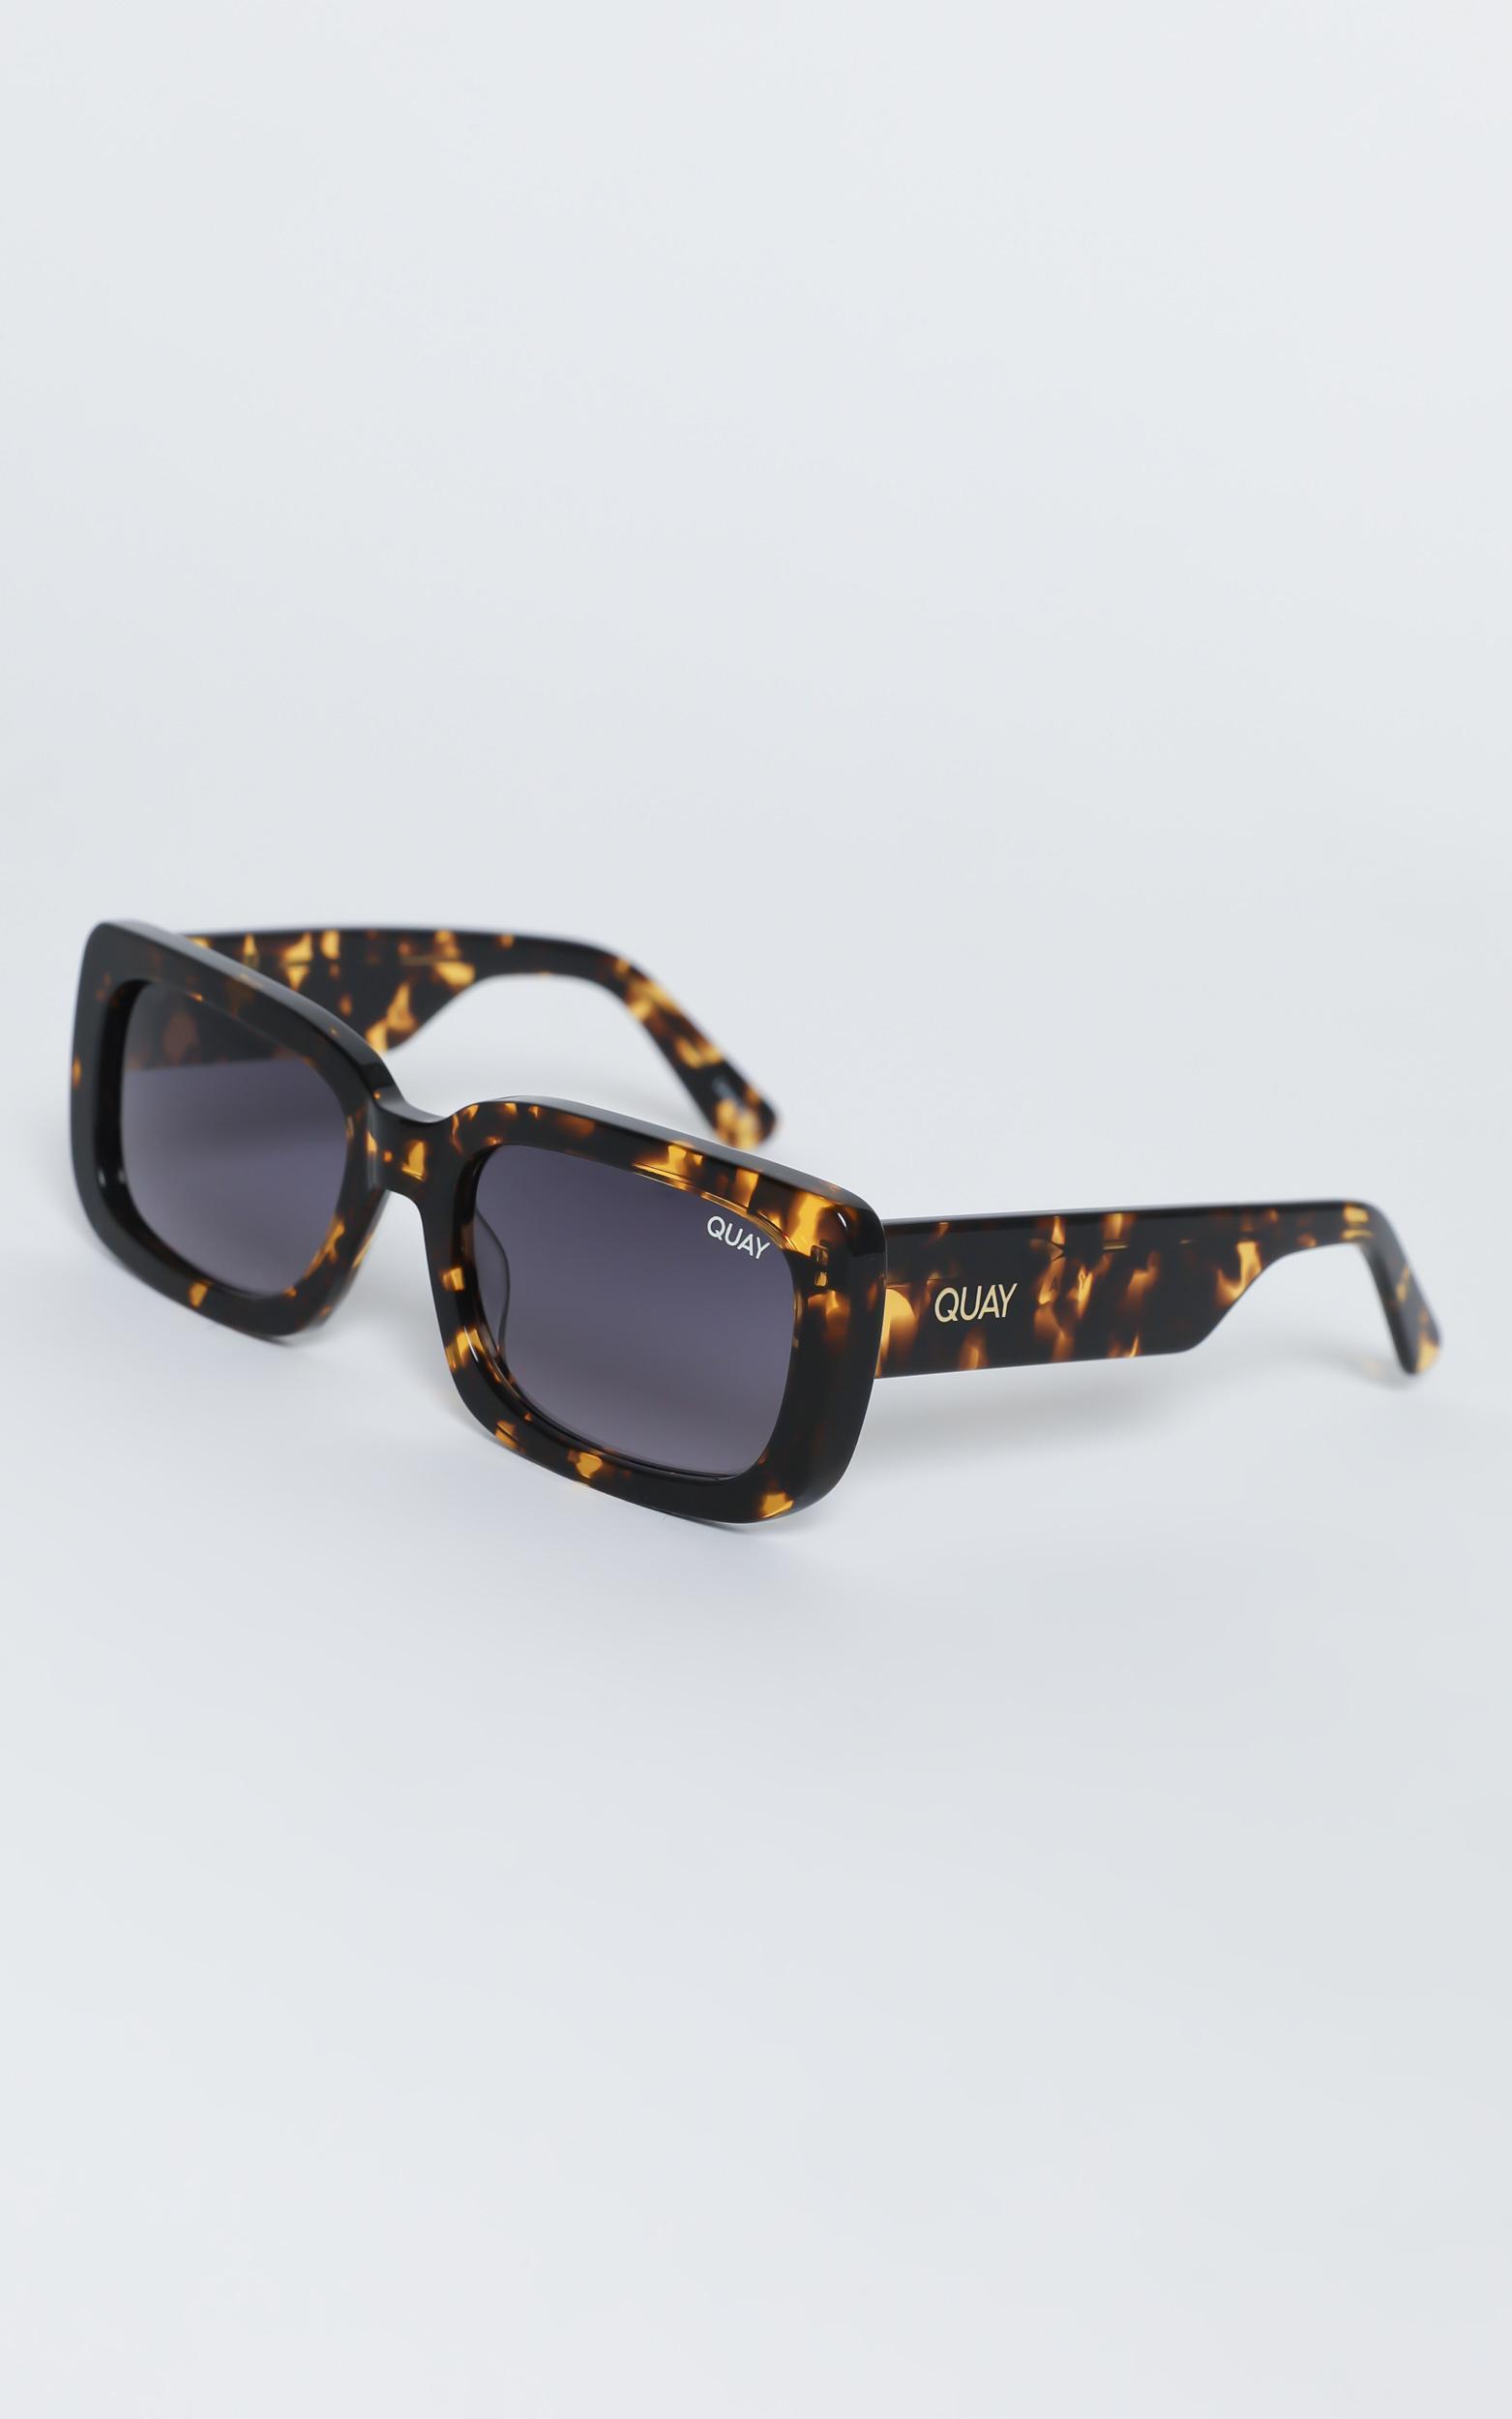 Quay - Yada Yada Sunglasses in Tort / Smoke, , hi-res image number null